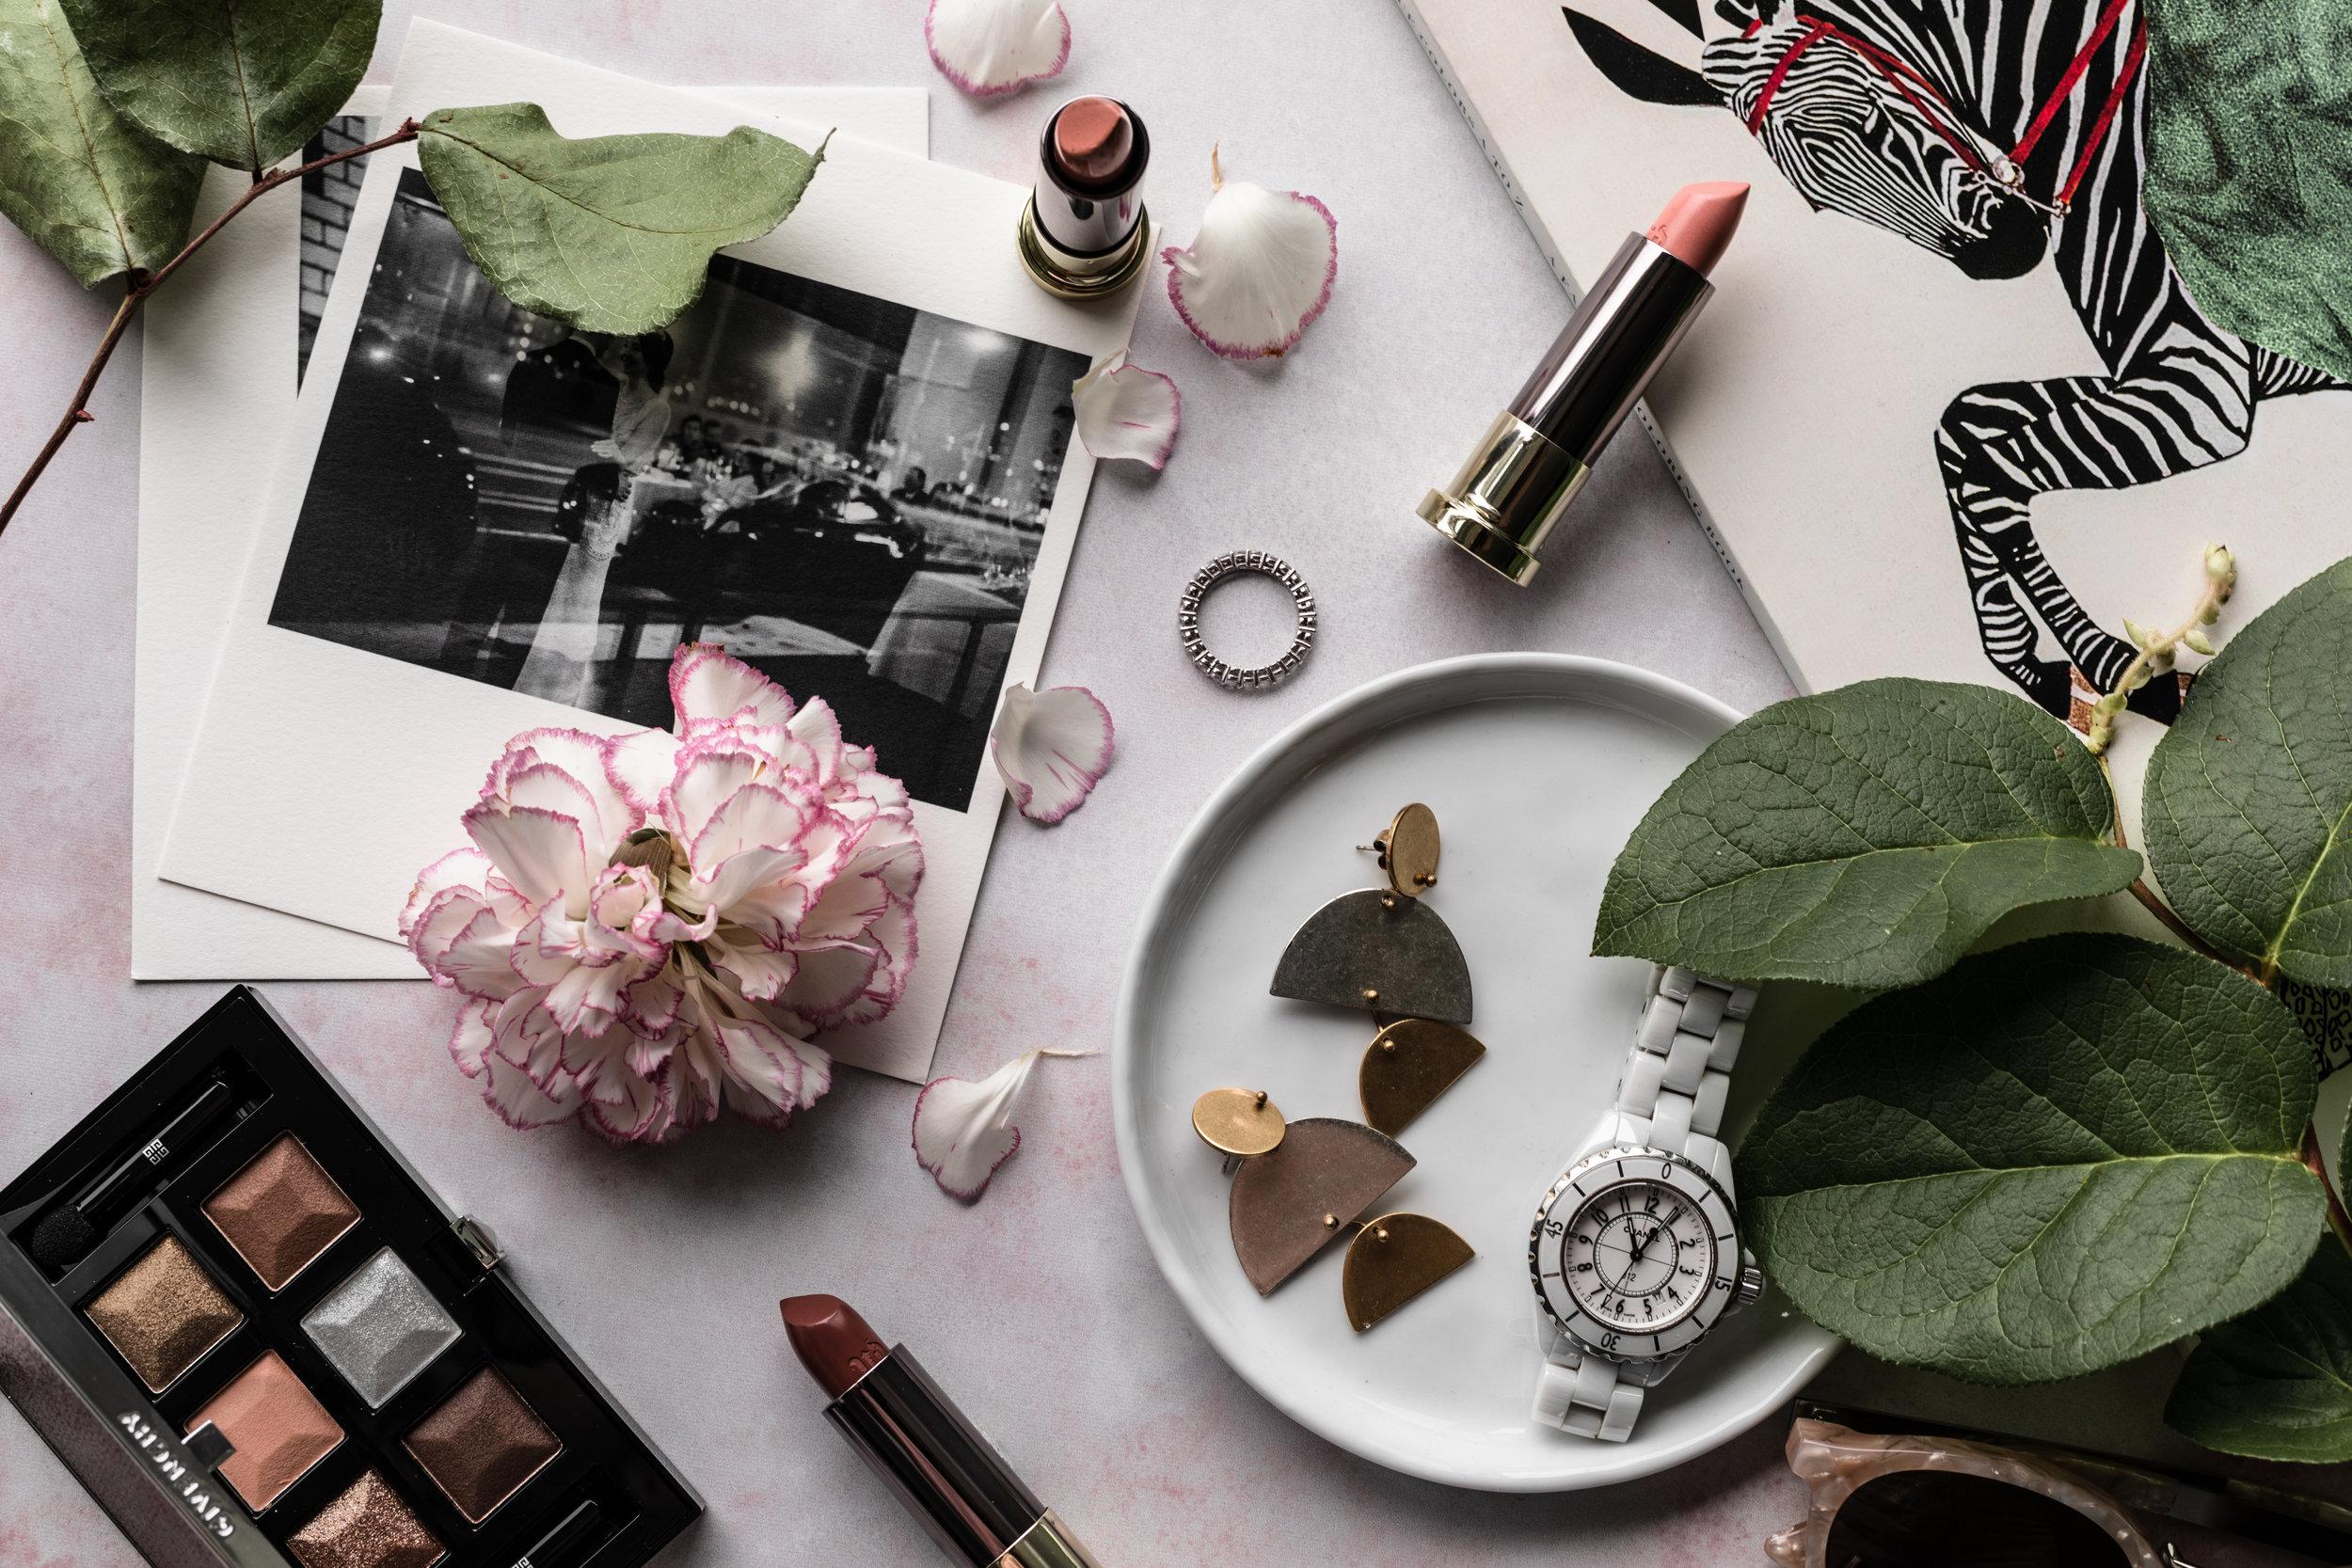 feminine-flatlay-cosmetics-lifestyle-photography-jesica-kurashima.jpg